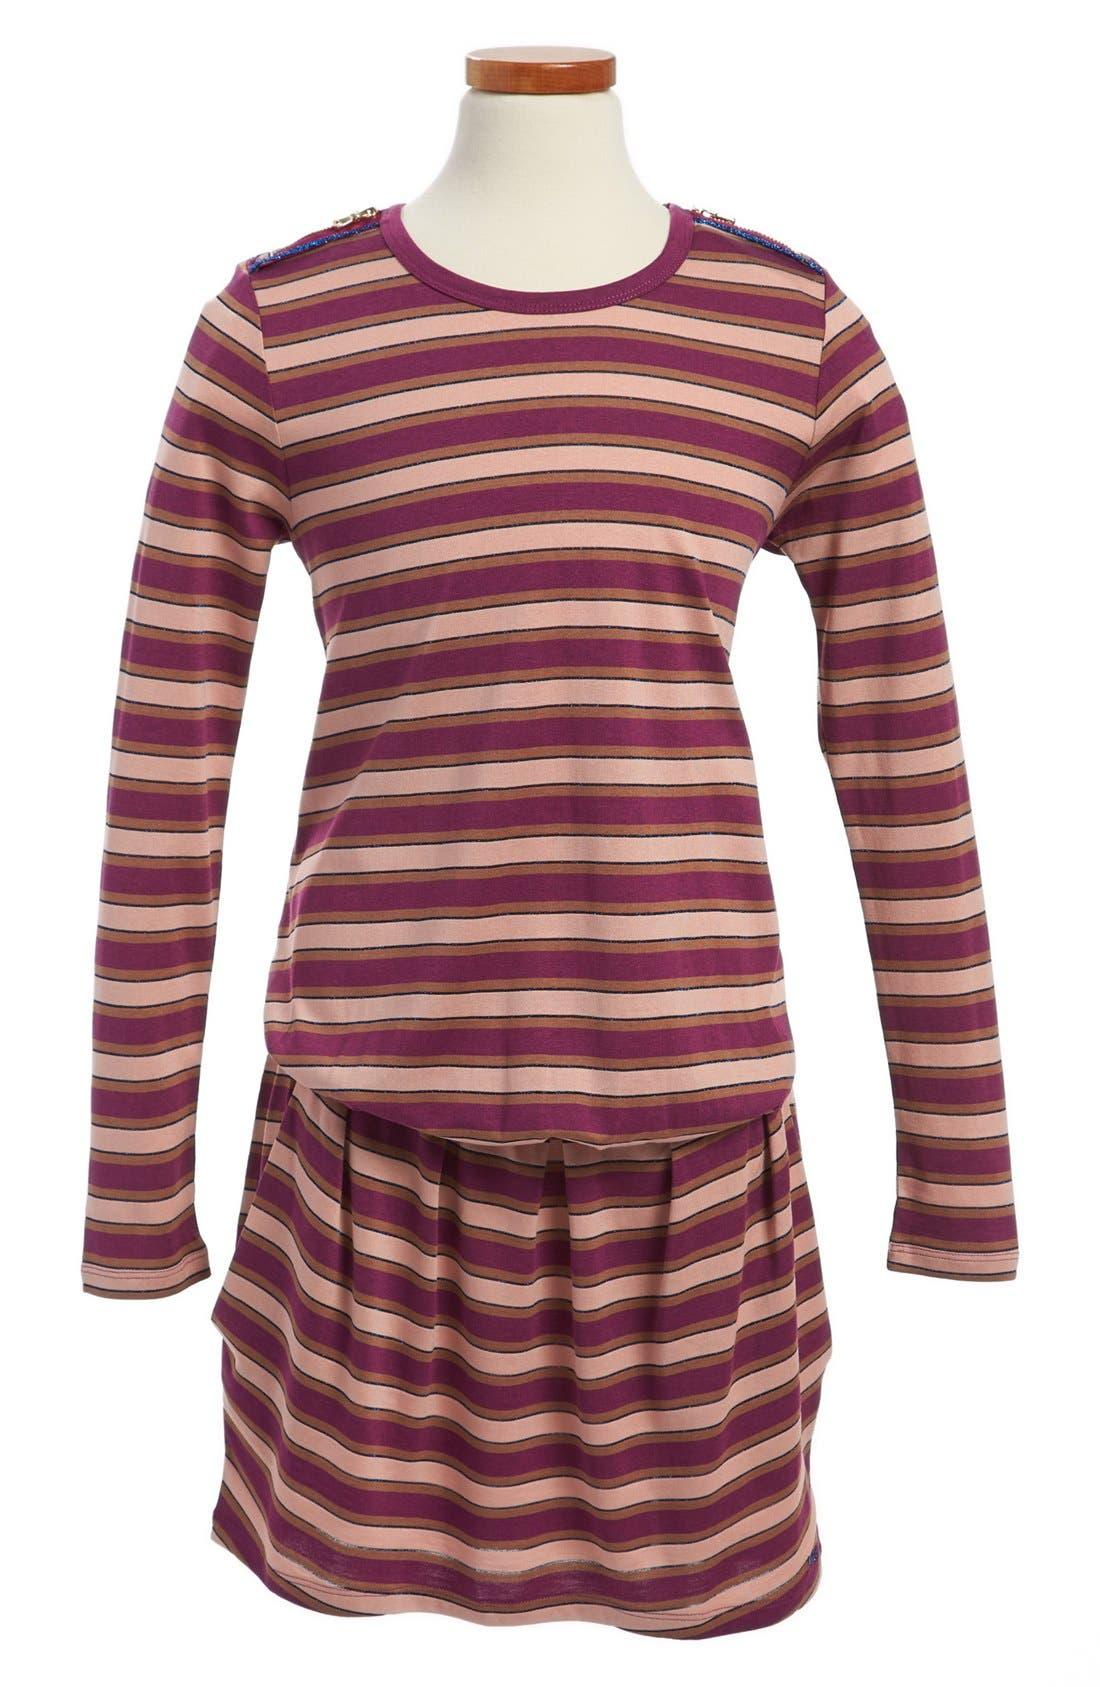 Alternate Image 1 Selected - LITTLE MARC JACOBS Long Sleeve Jersey Dress (Toddler Girls, Little Girls & Big Girls)